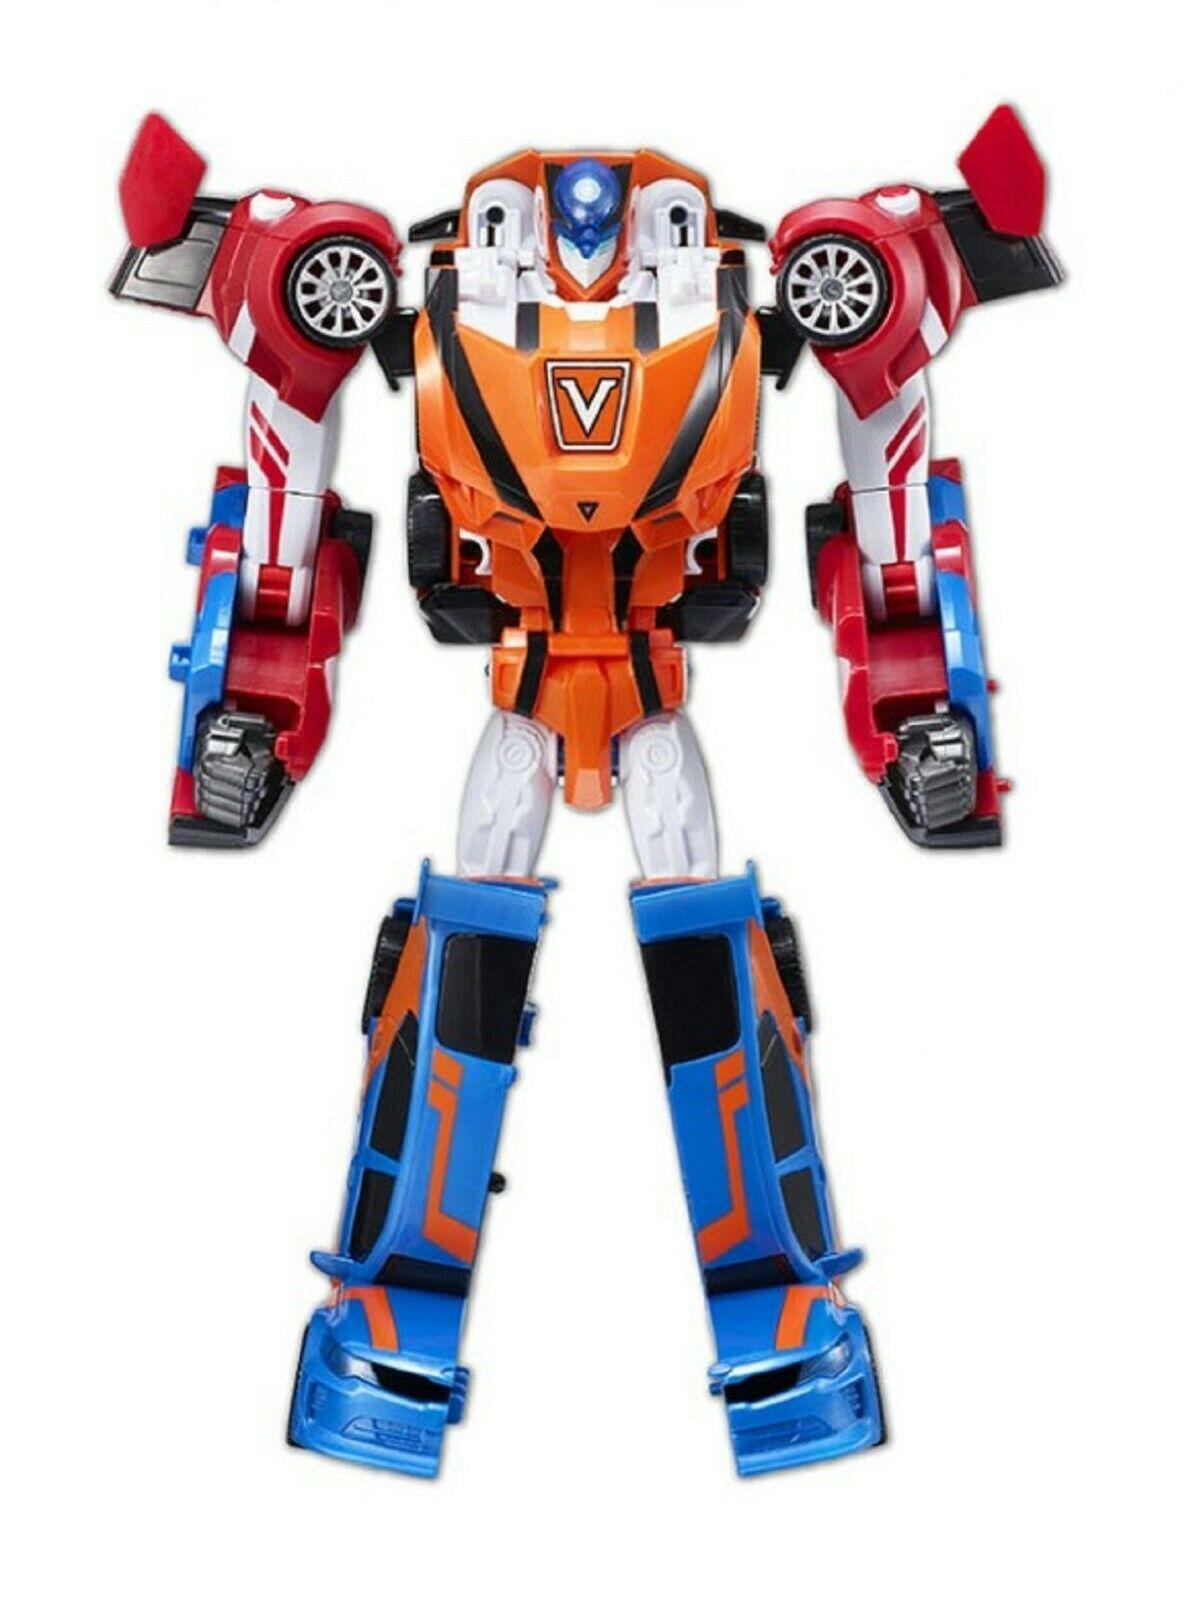 Tobot V Grand Champion Transformation Action Figure